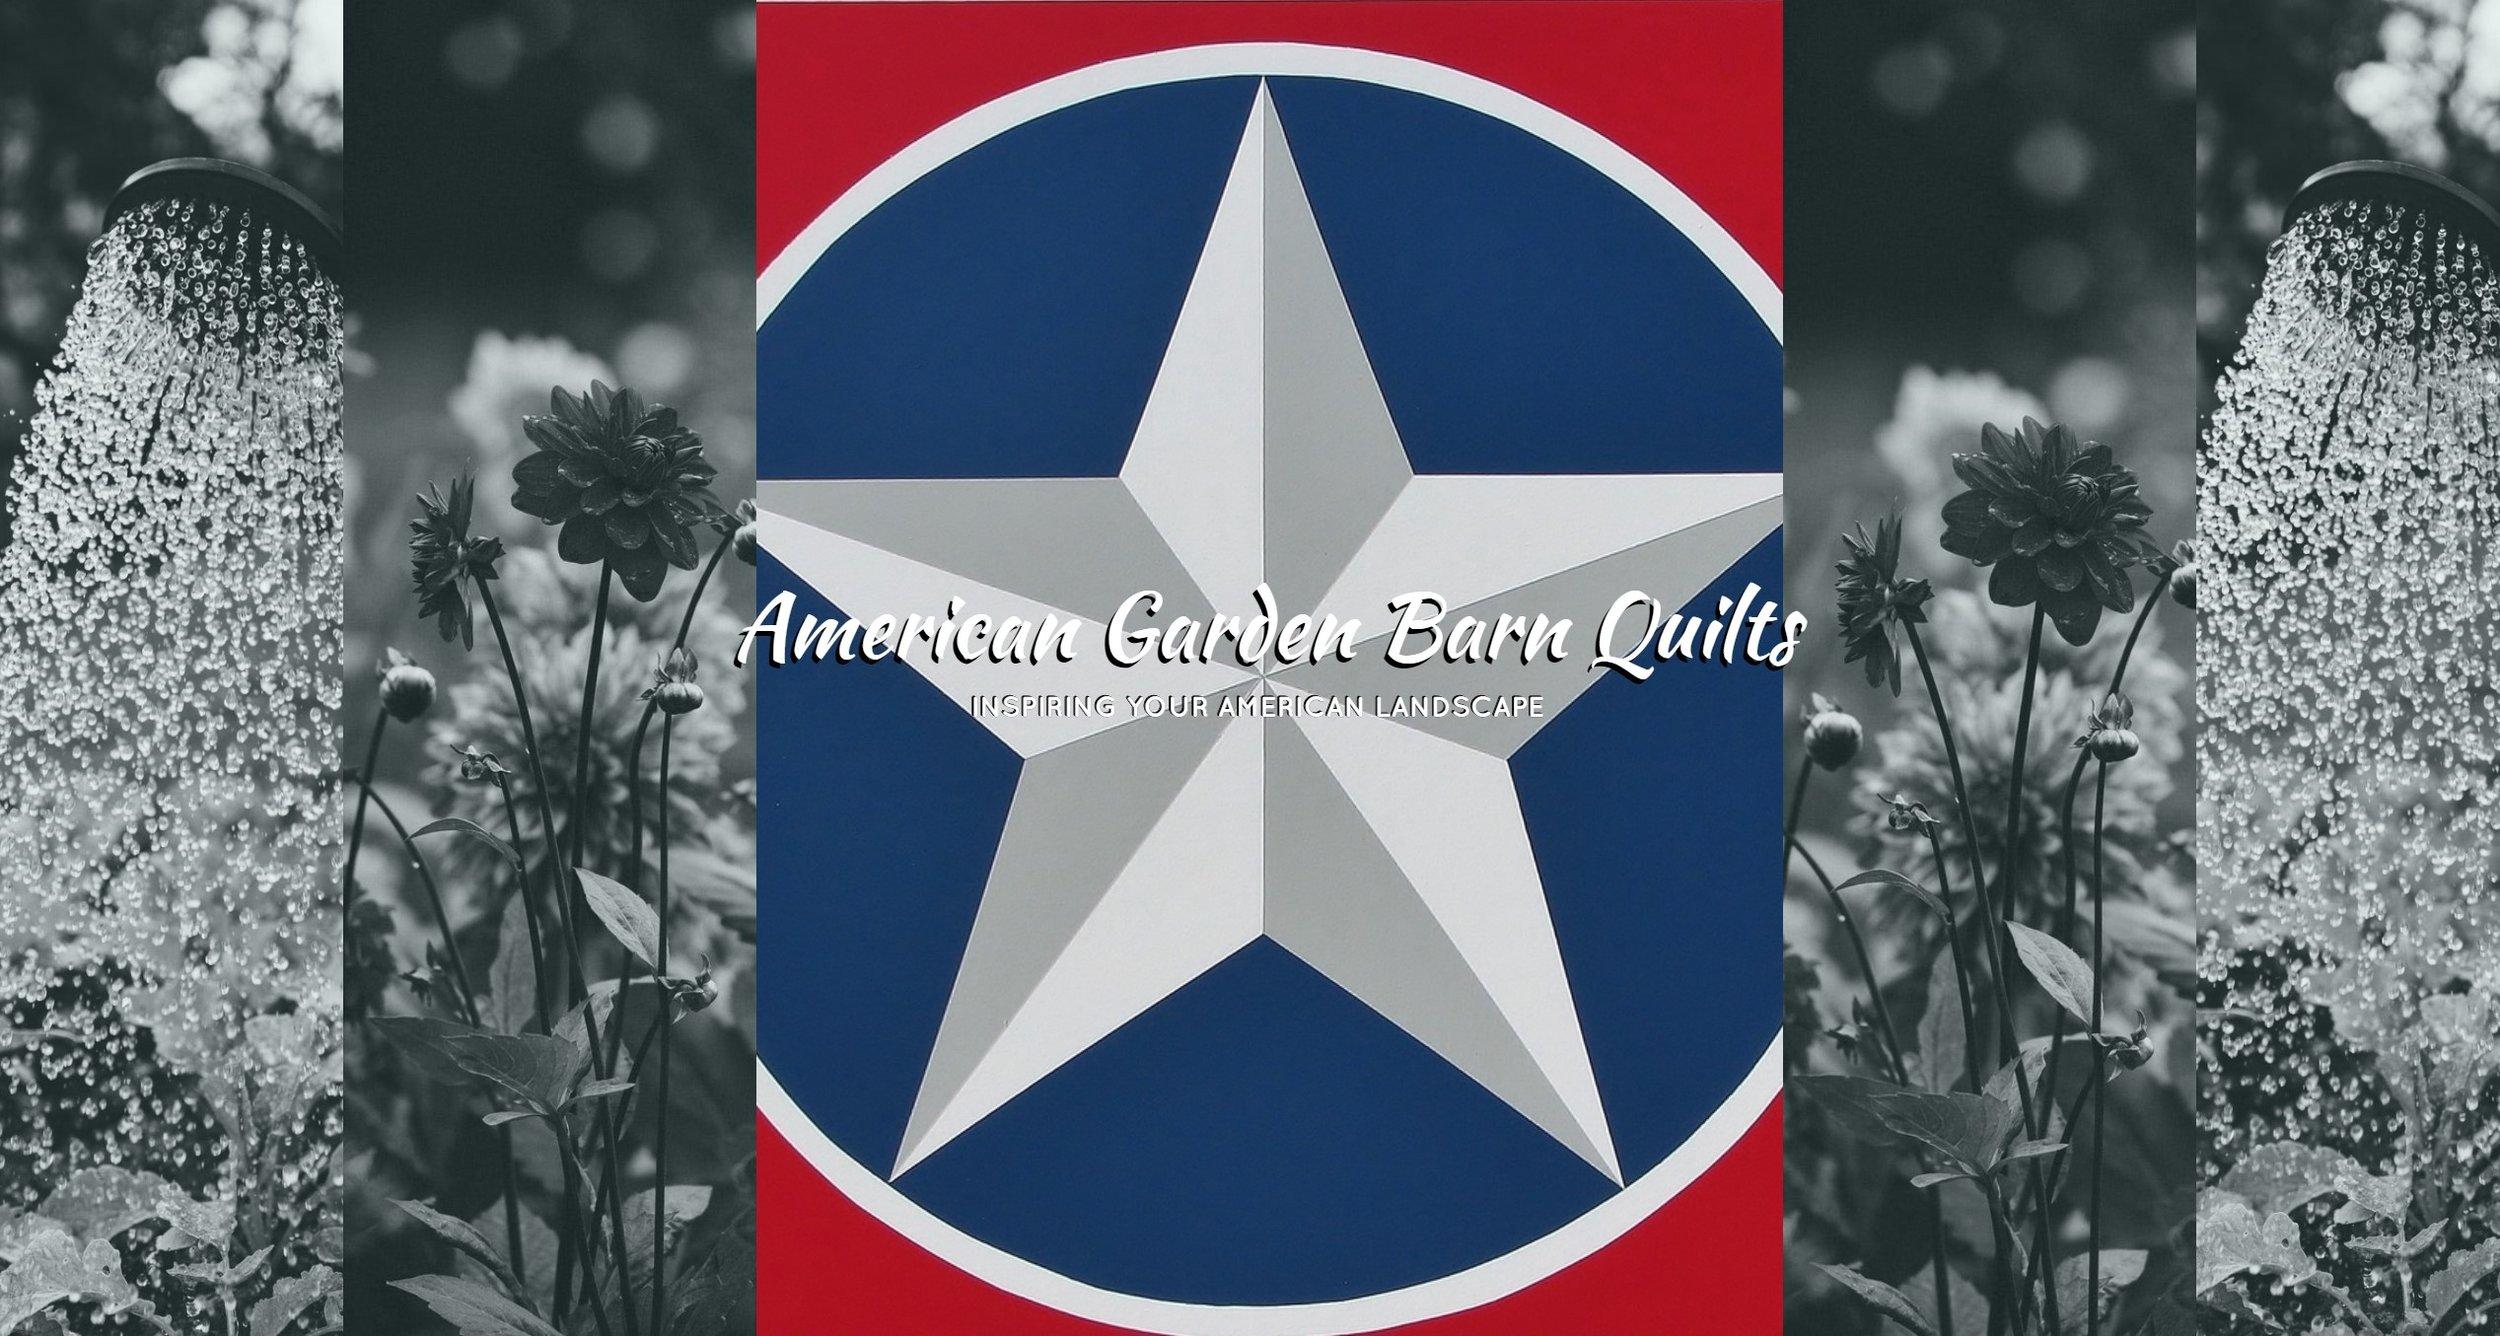 American Garden Barn Quilts SHOP